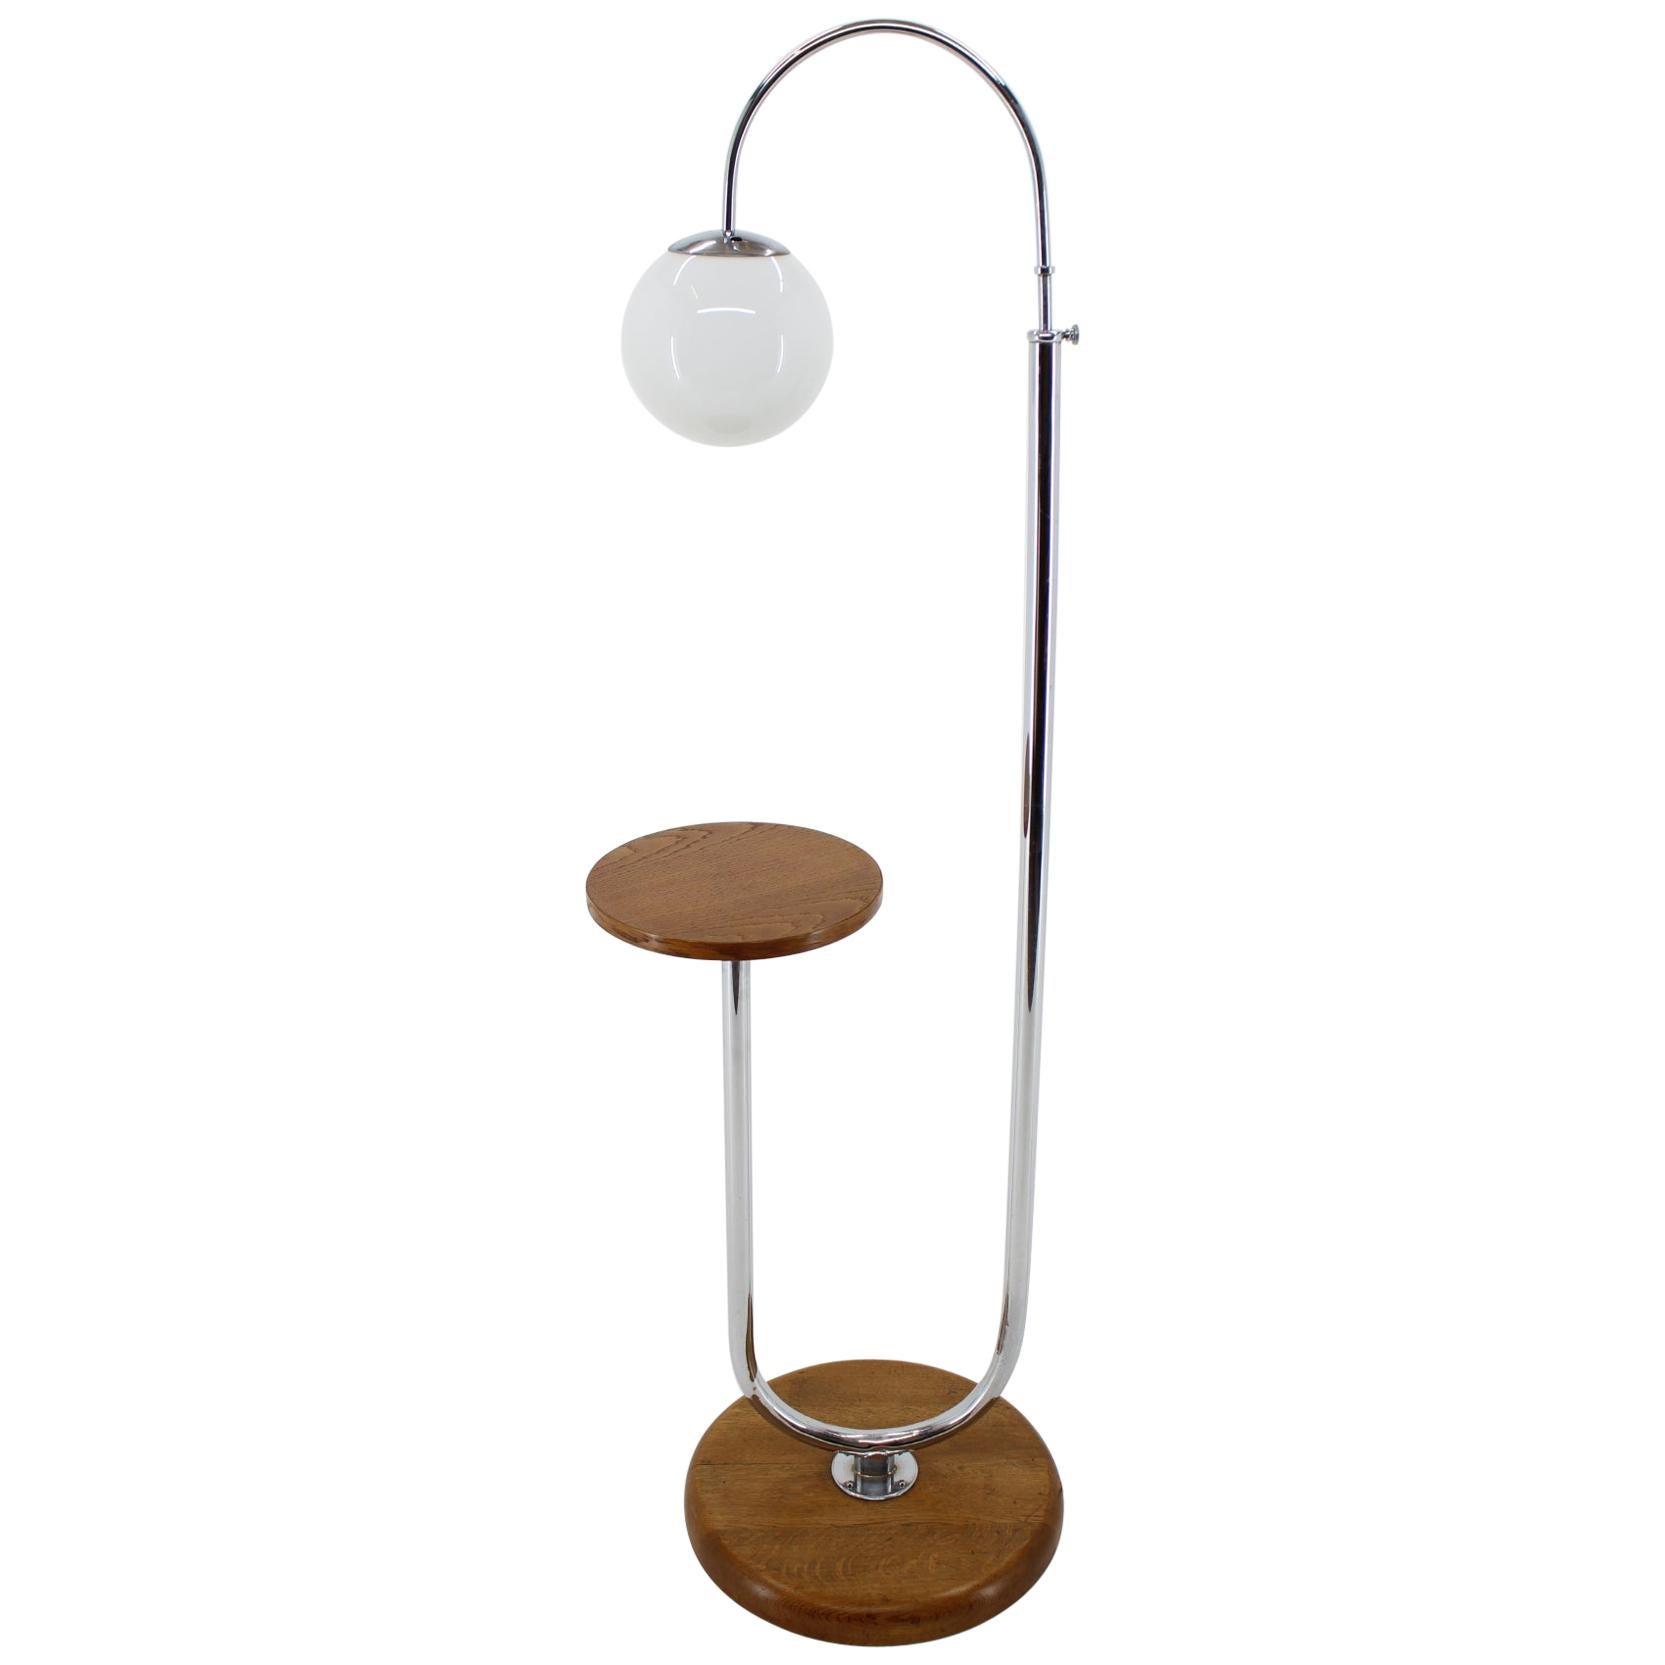 1930s Art Deco Floor Lamp, Czechoslovakia